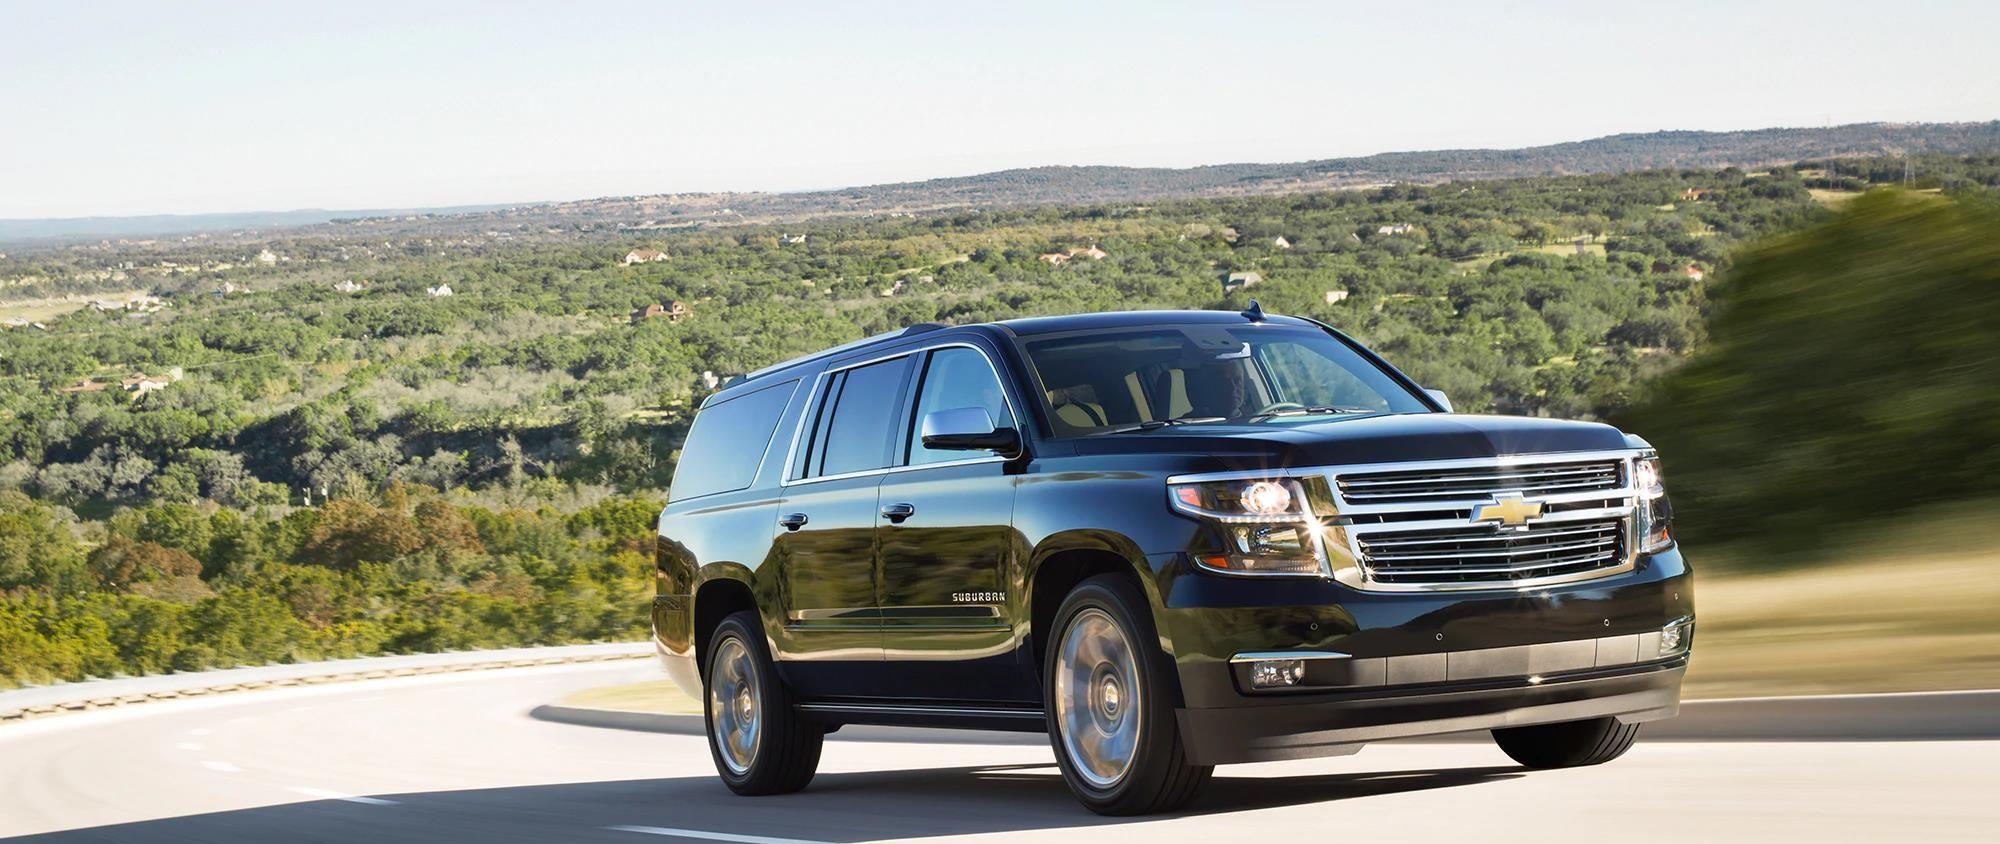 Chevrolet Suburban 2018 a la venta cerca de Manassas, VA